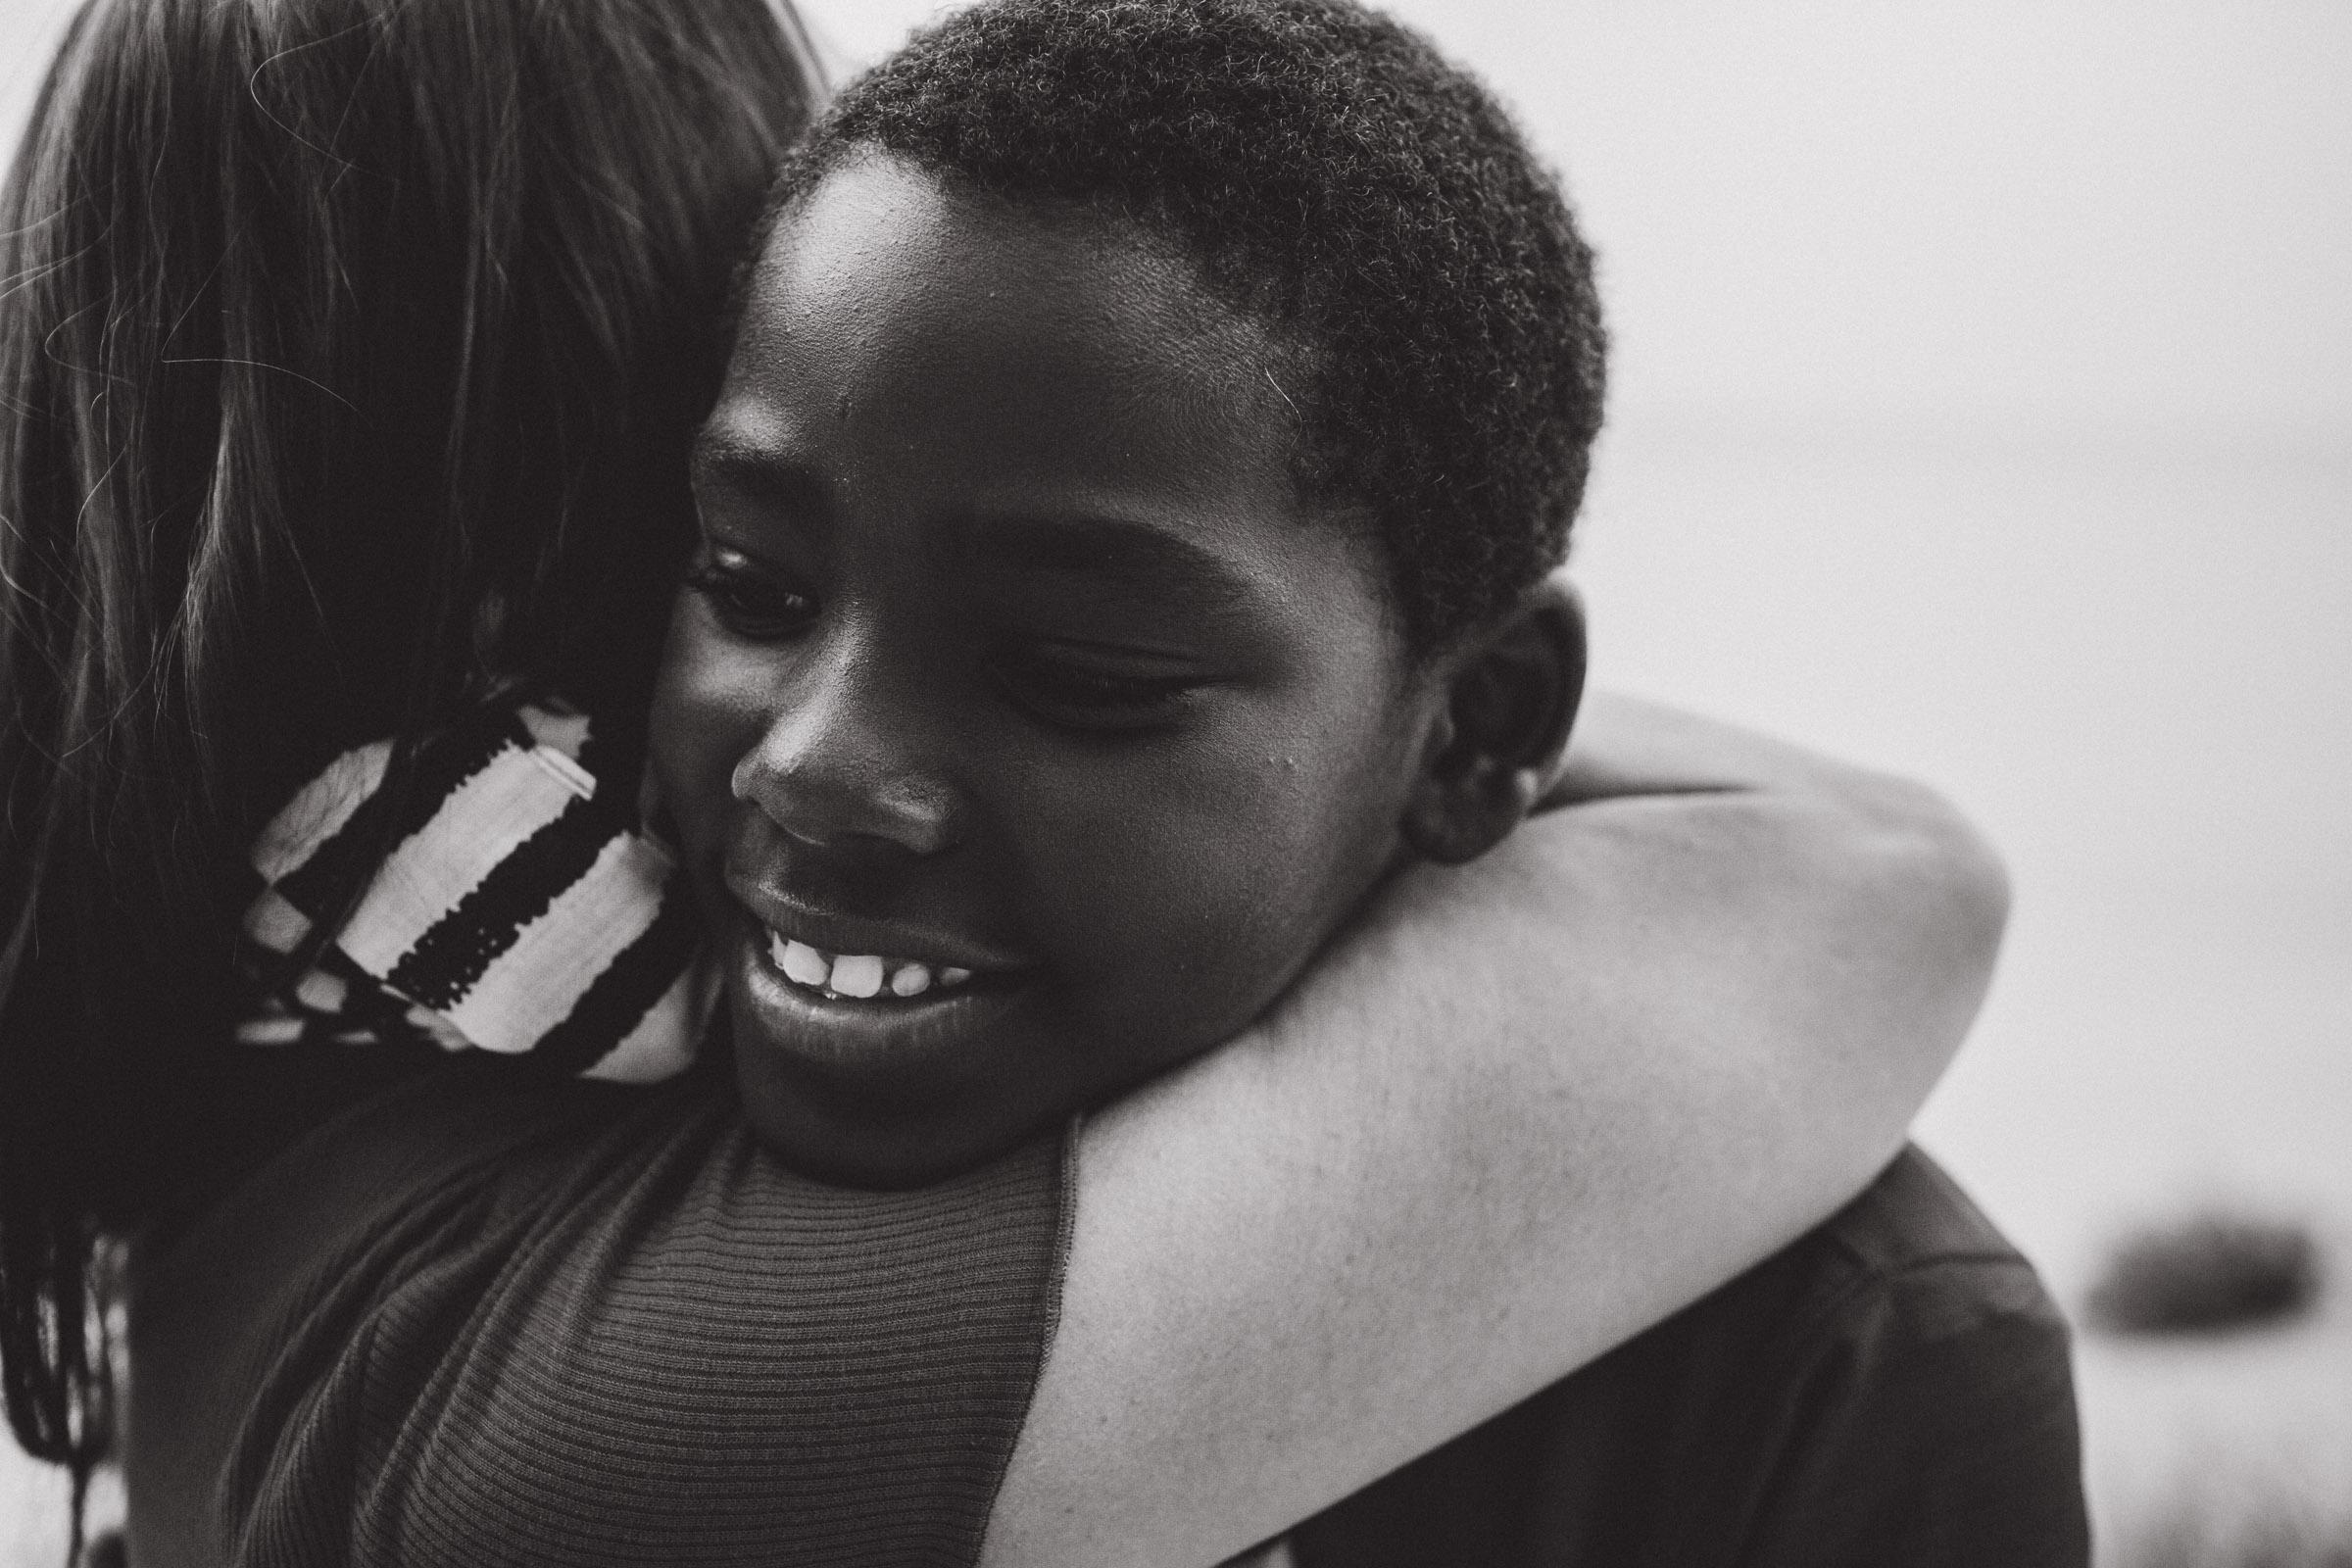 a son giving his mother a giant hug